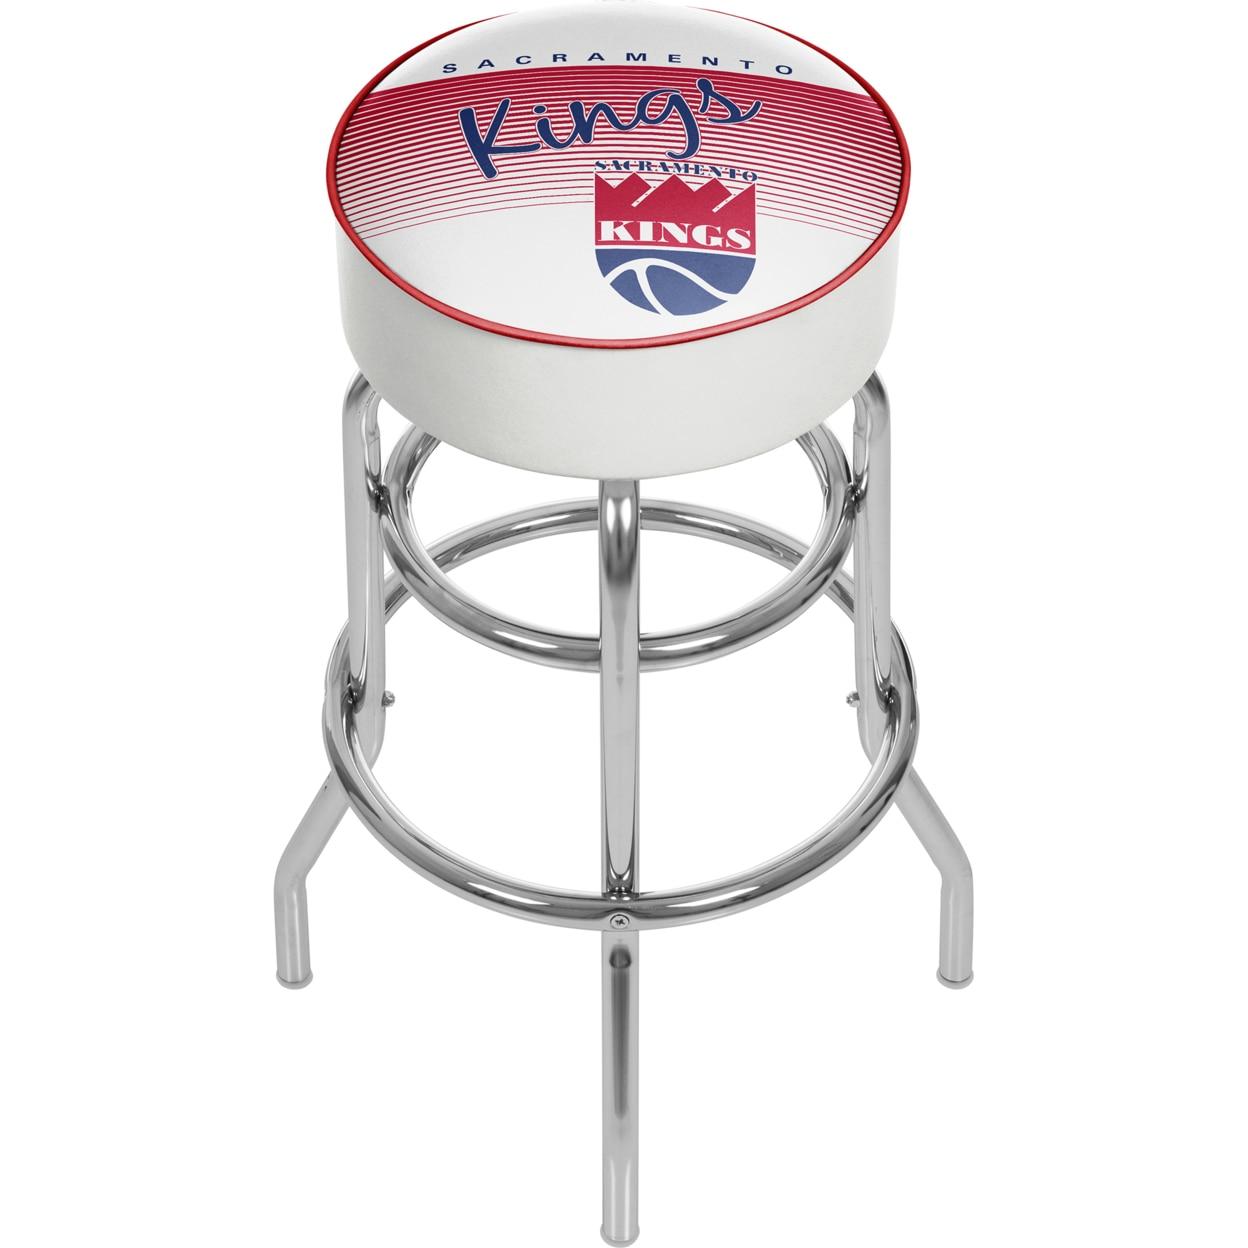 цены Sacramento Kings NBA Hardwood Classics Padded Swivel Bar Stool 30 Inches High